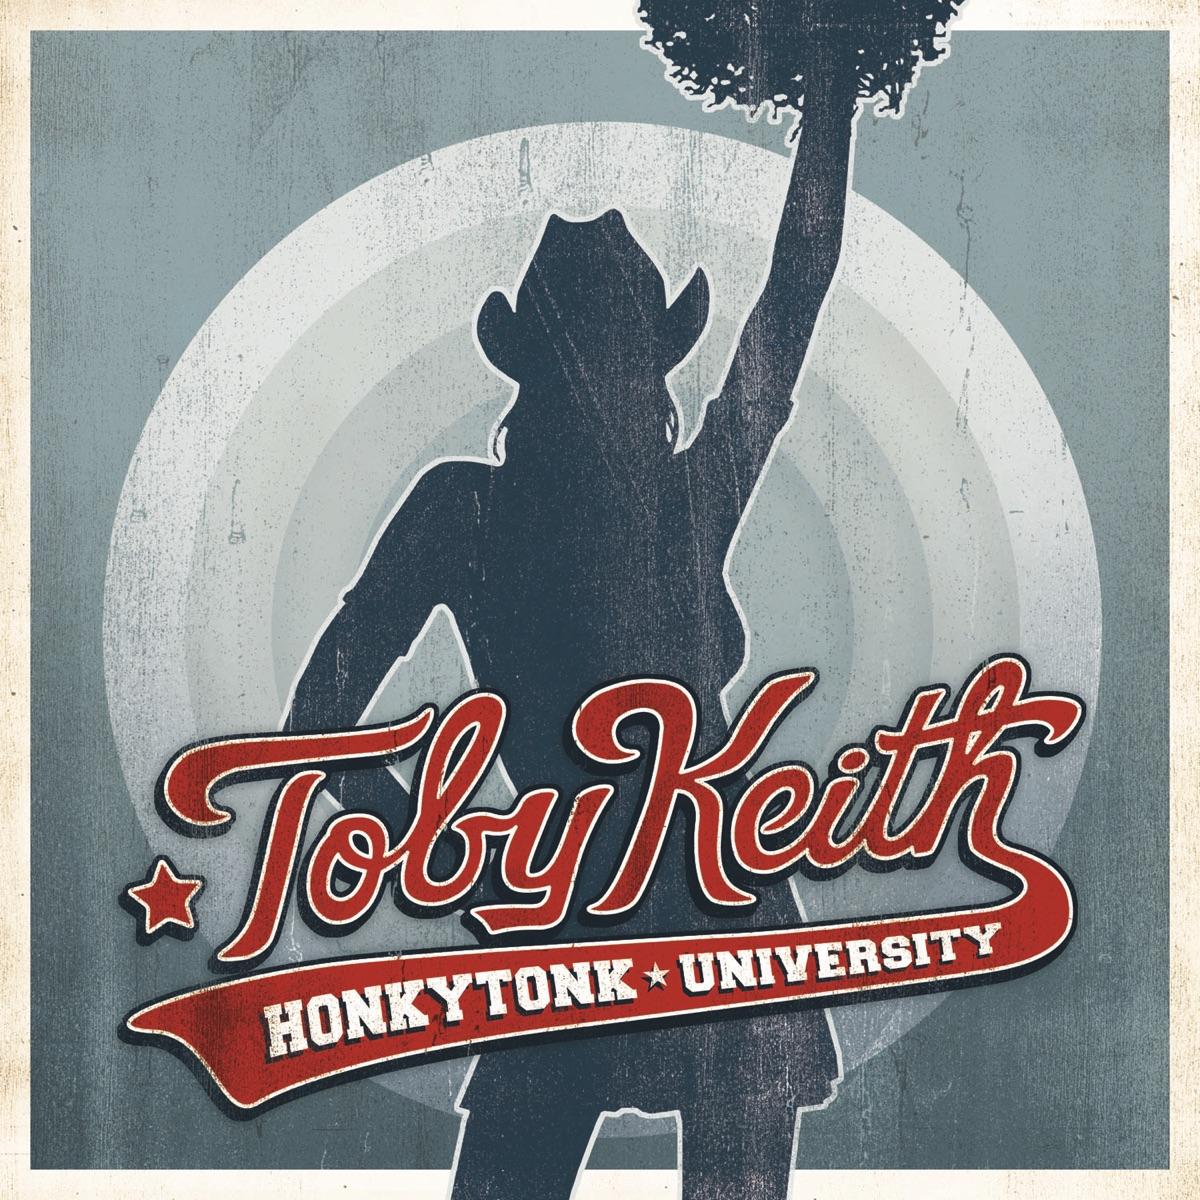 Honkytonk University Toby Keith CD cover